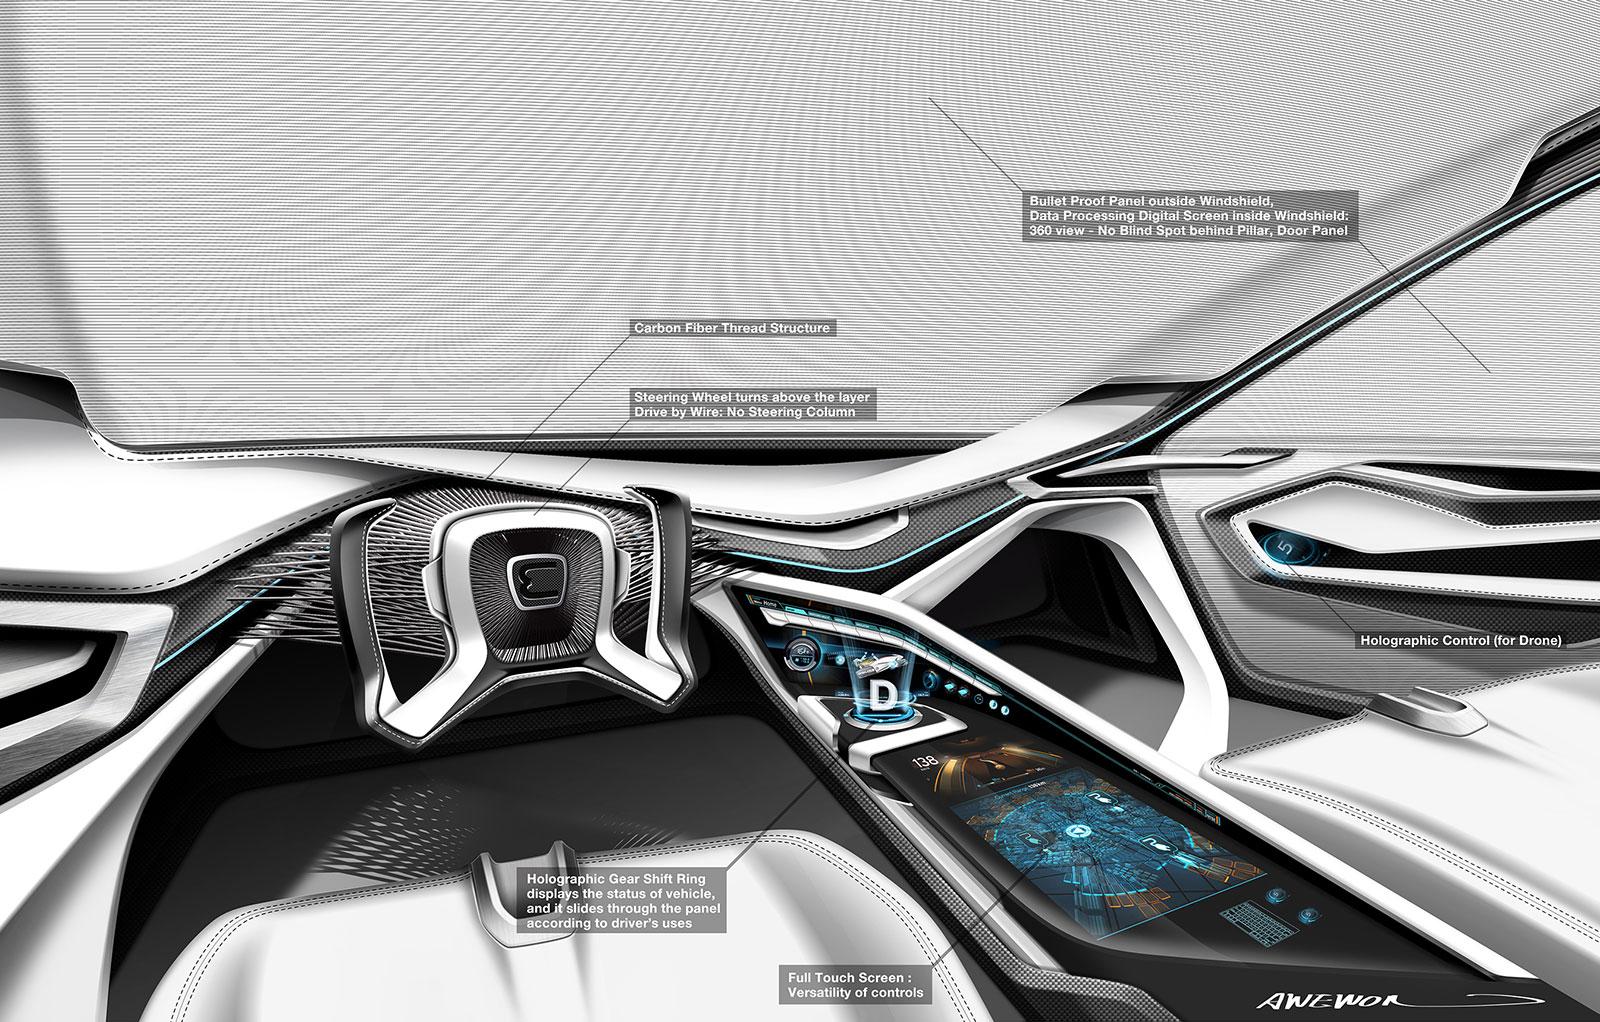 Bmw m9 interior bmw m9 concept design 2017 2018 best for M concept interior design